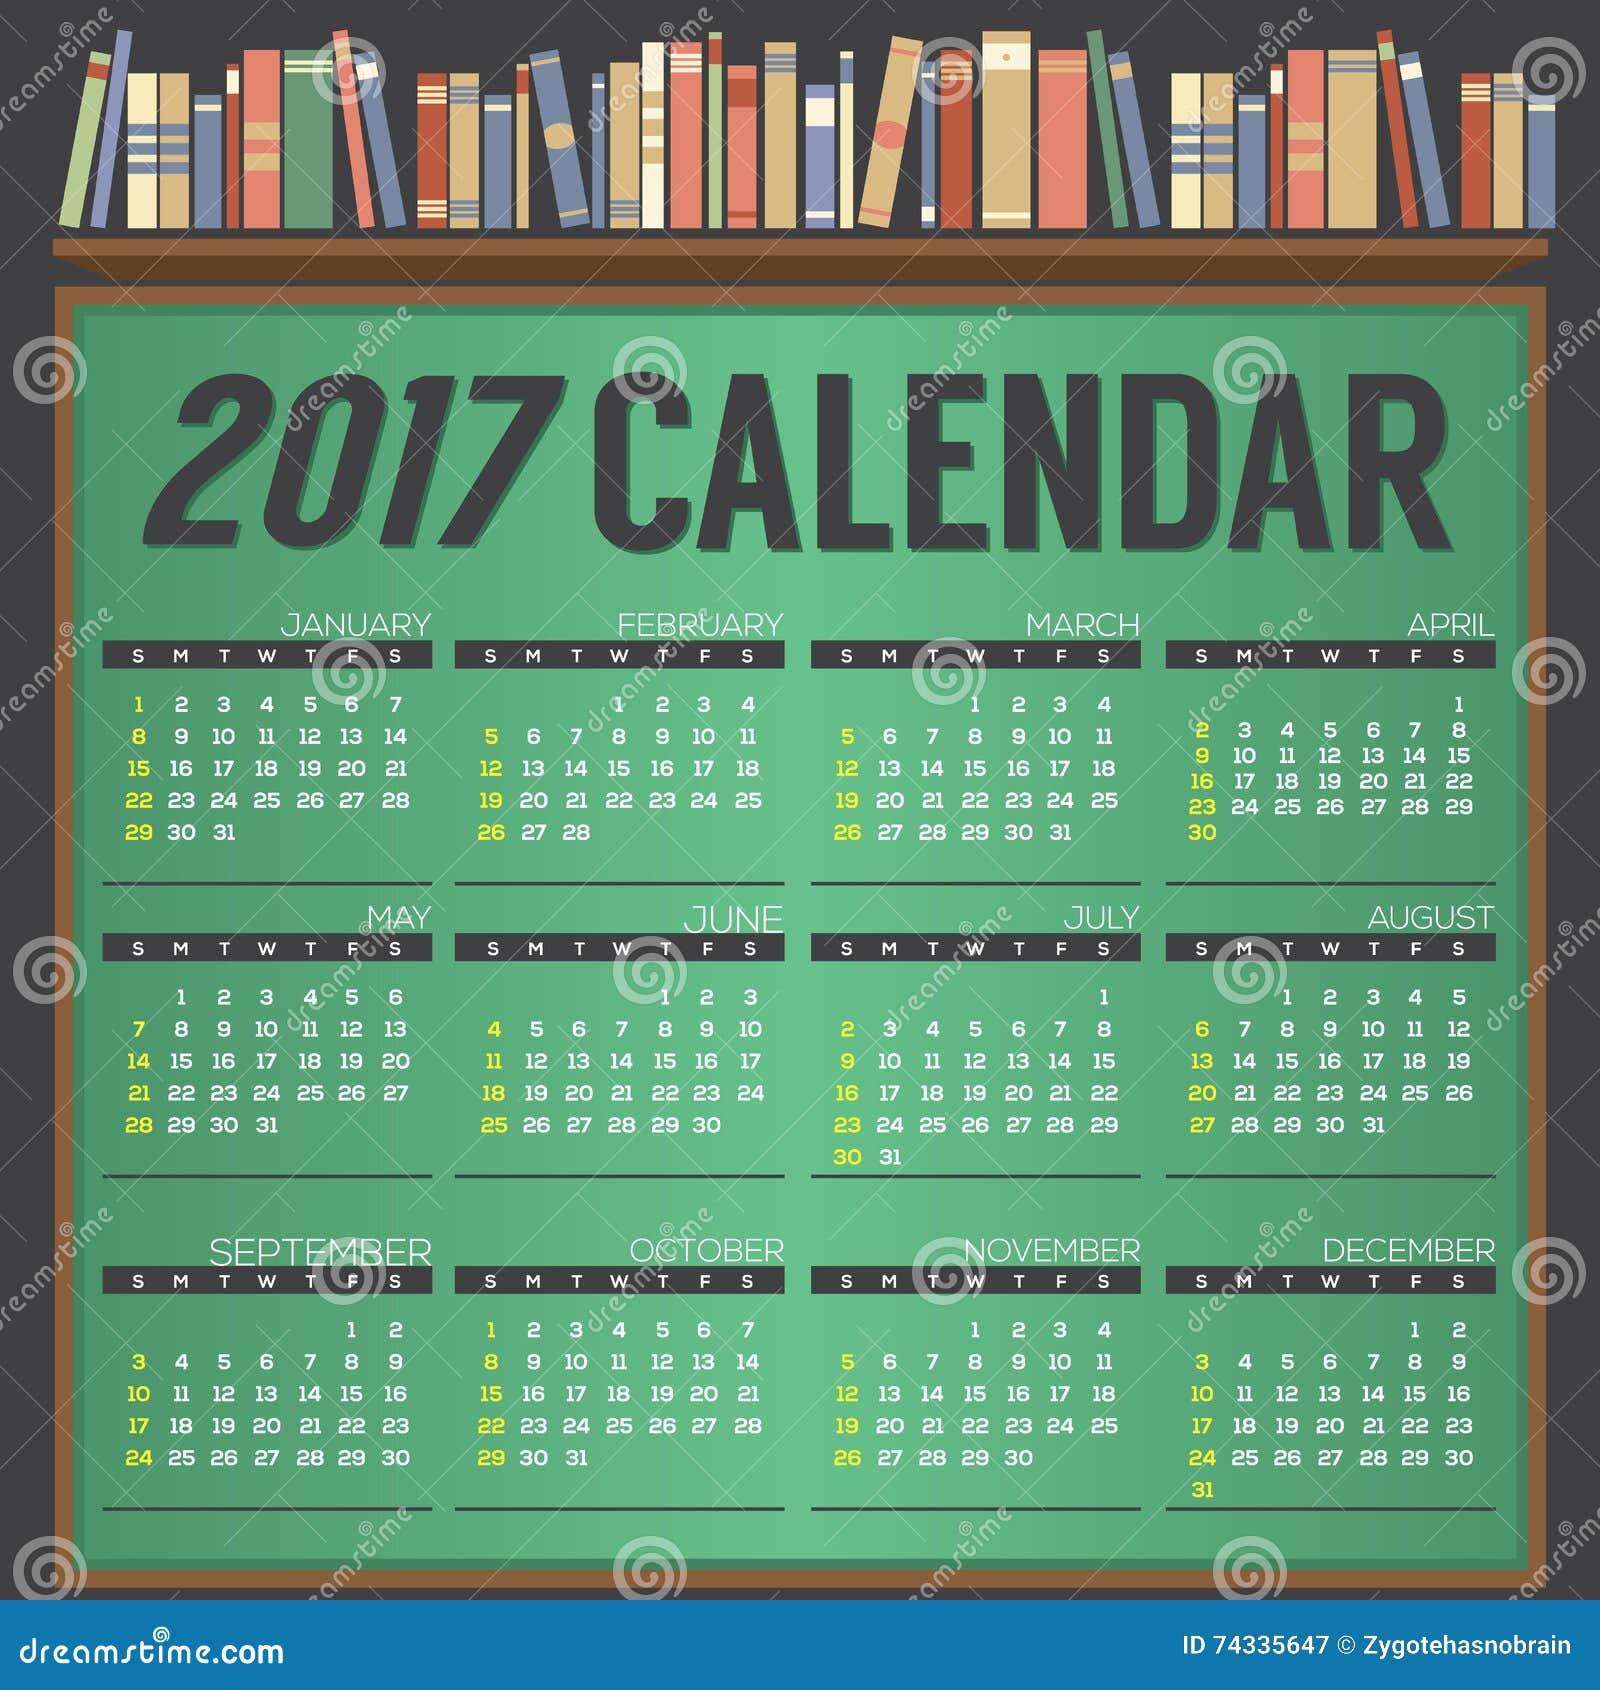 Calendar Illustration Board : Printable calendar starts sunday on chalk board